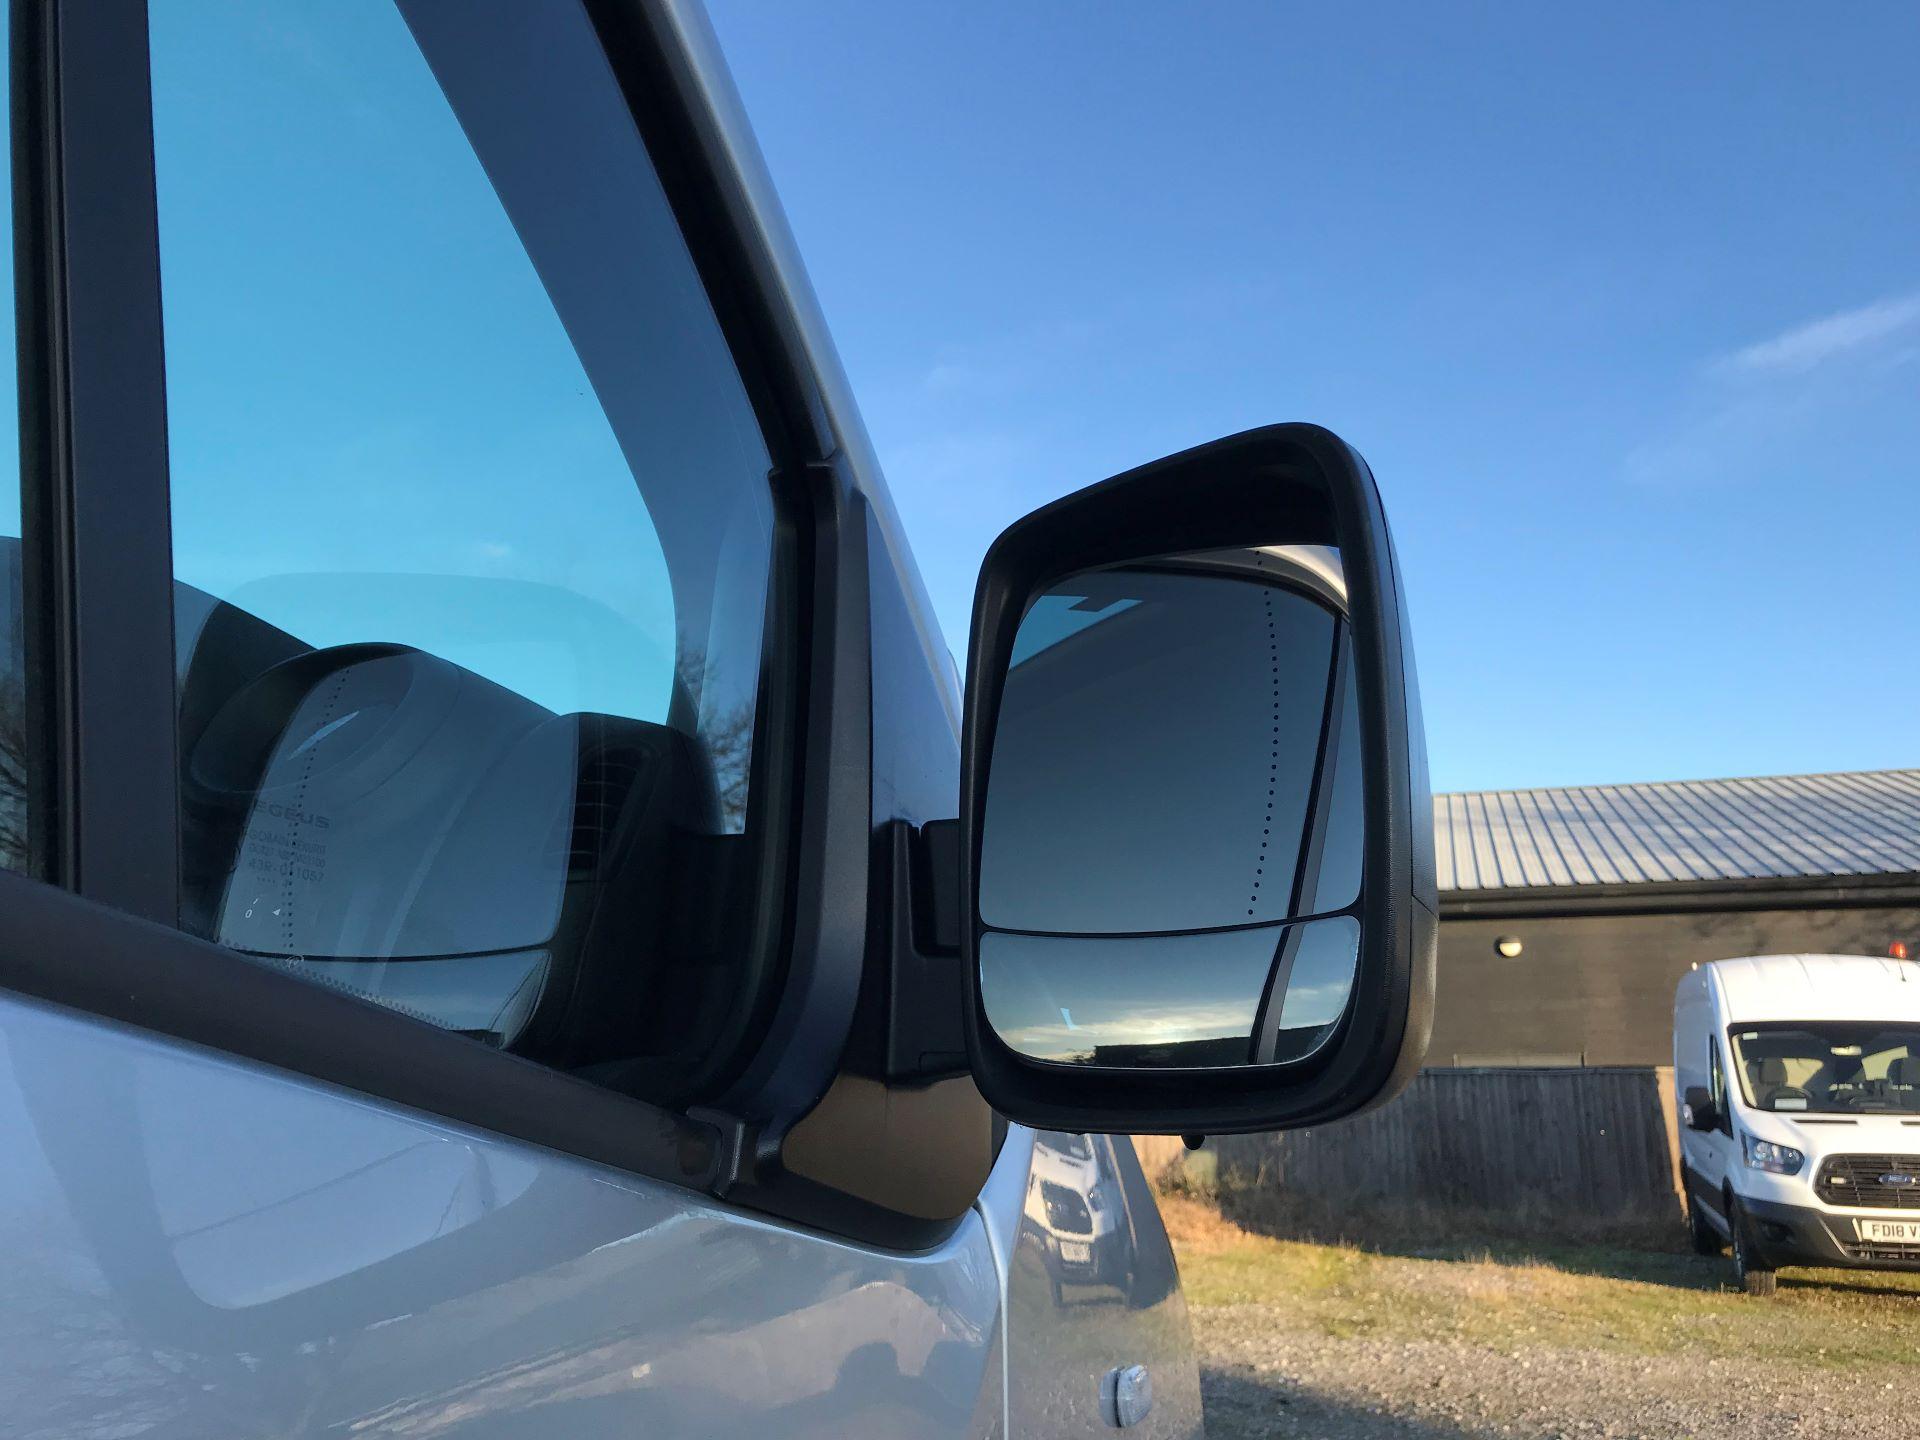 2017 Vauxhall Vivaro 2900 1.6Cdti Biturbo 125Ps H1 Combi 9 Seat (DY17UVM) Image 14